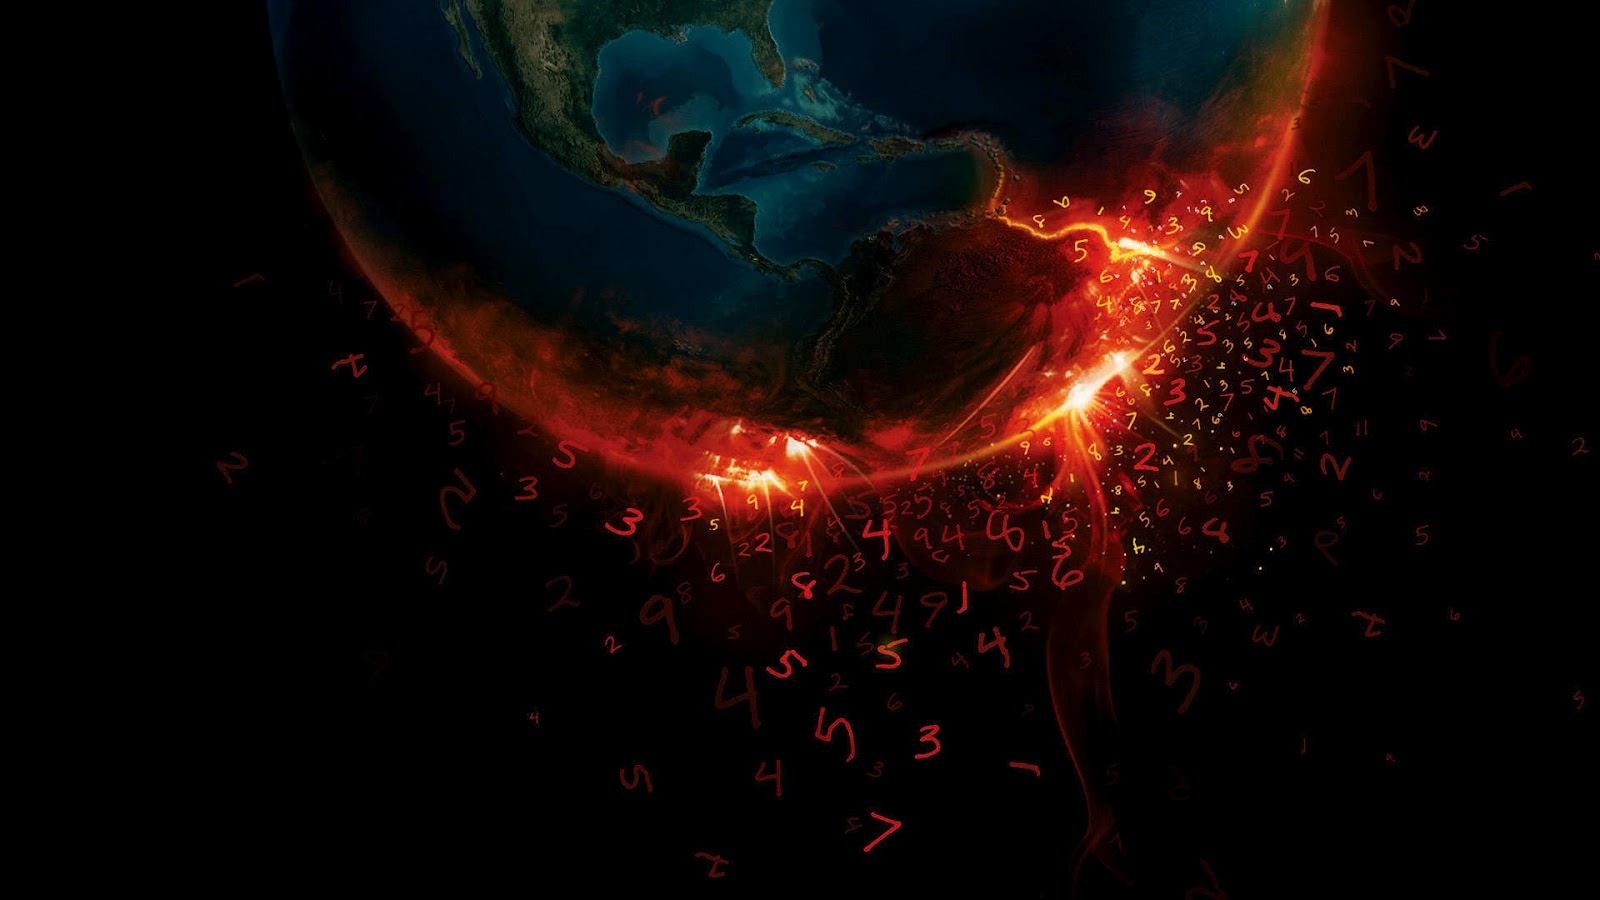 http://4.bp.blogspot.com/-vCX-5er36jo/T38--bmL28I/AAAAAAAAC_0/EDEnuQJmlL8/s1600/earth_burn_digits-HD.jpg